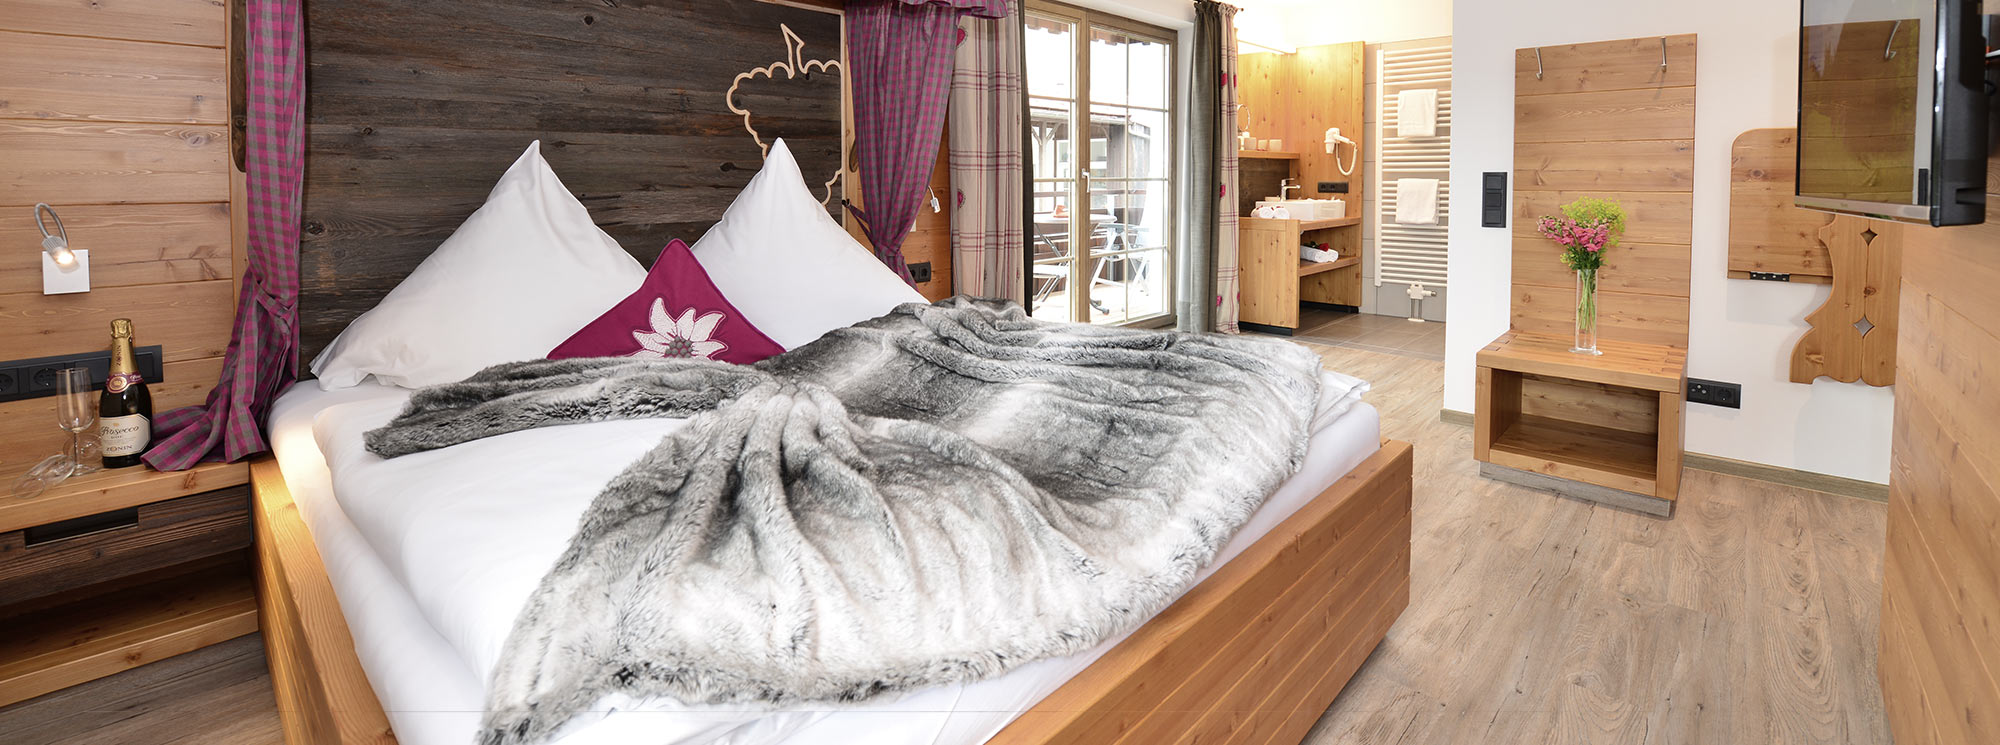 Ihr Hotel in Oberstdorf!